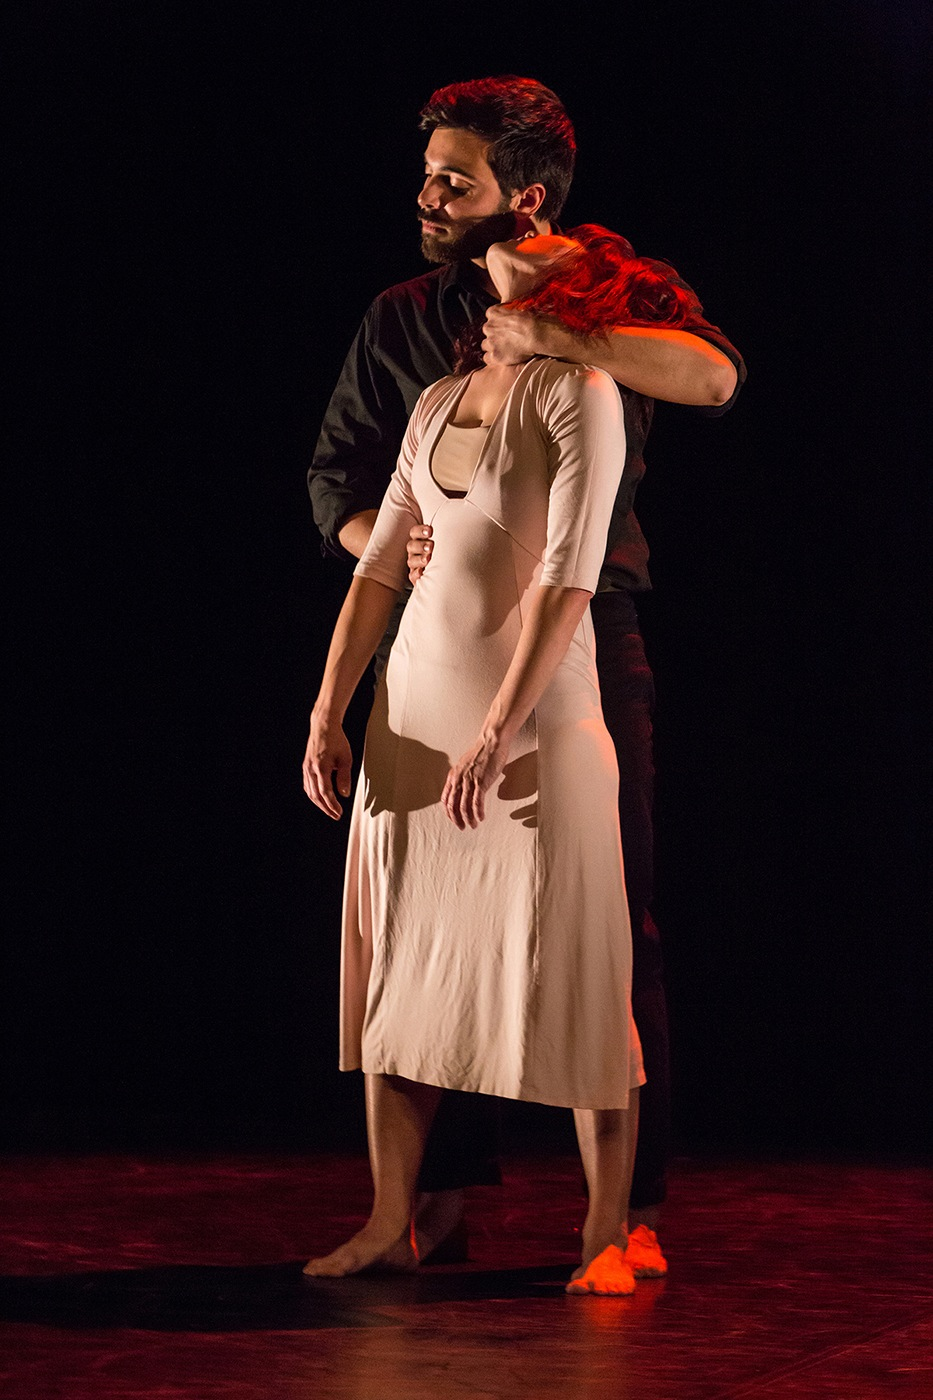 photographe-reportage-danse-avec-ton-crous-guillaume-heraud-041-small